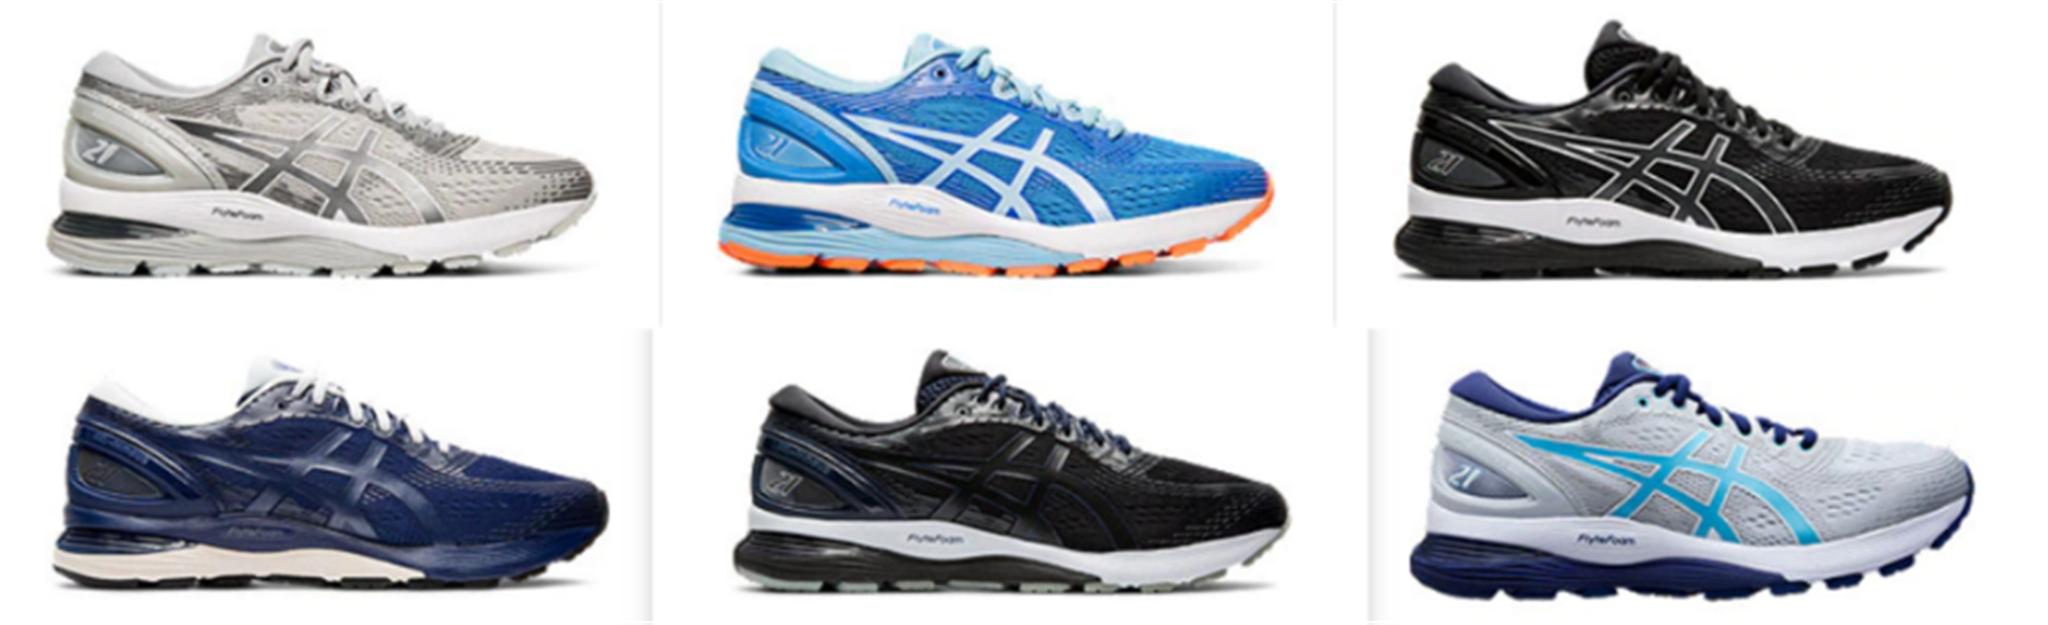 Gel Nimbus 21 Running Shoes Only $75, Reg $160.00 + Free Shipping!